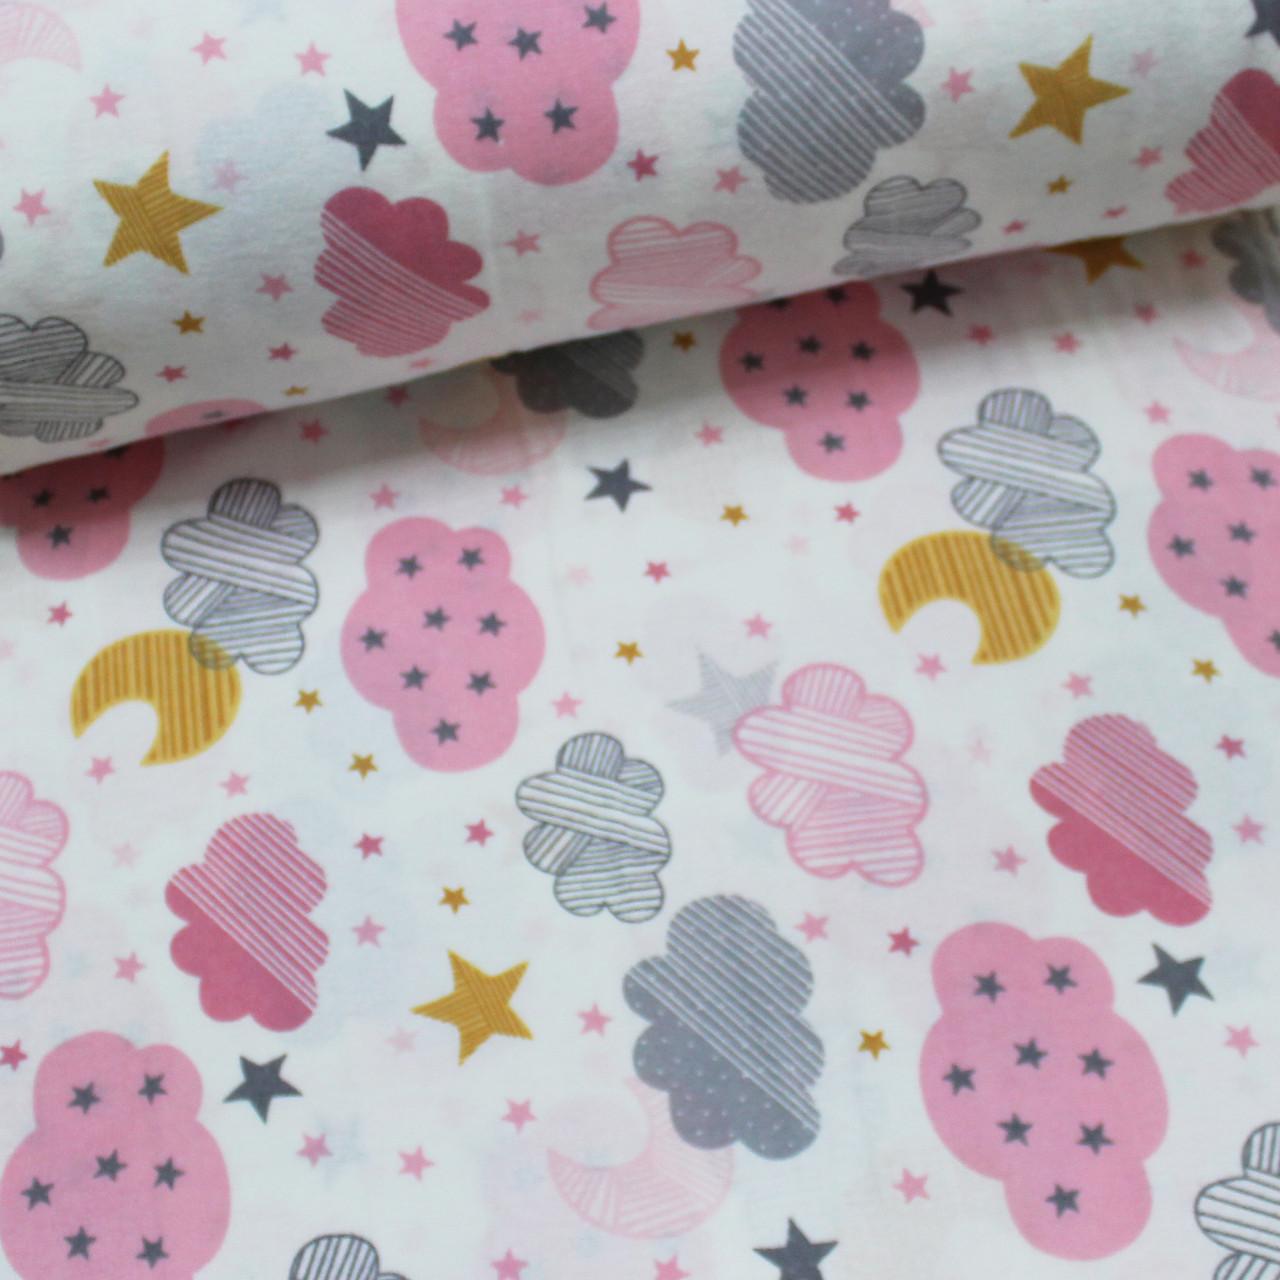 Фланелевая ткань (ТУРЦИЯ шир. 2,4) розово-серые облака